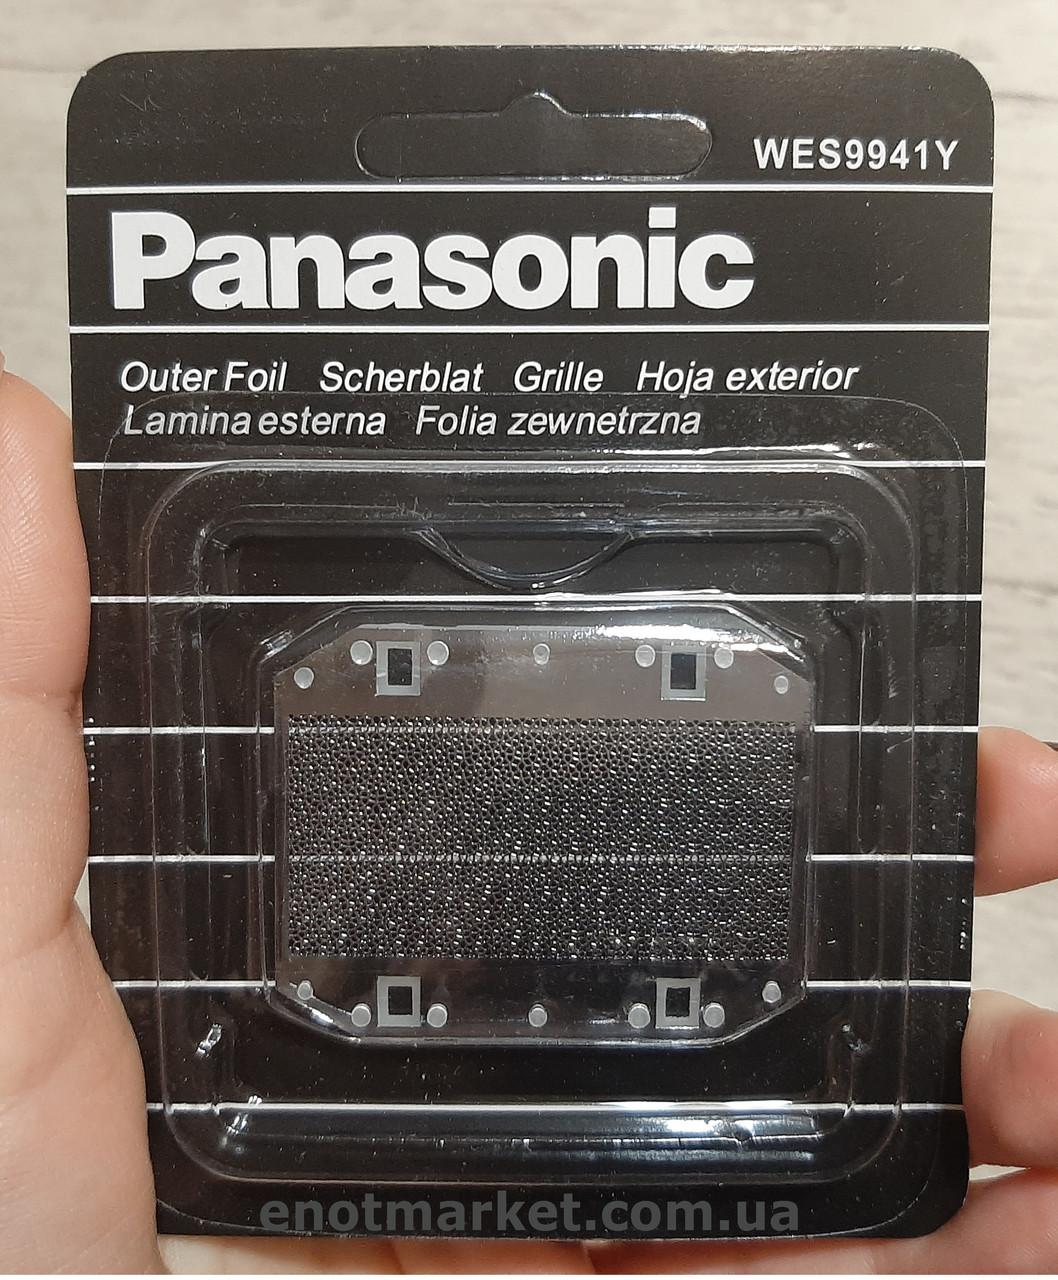 Сетка для электробритвы Panasonic WES 9941 Y silver